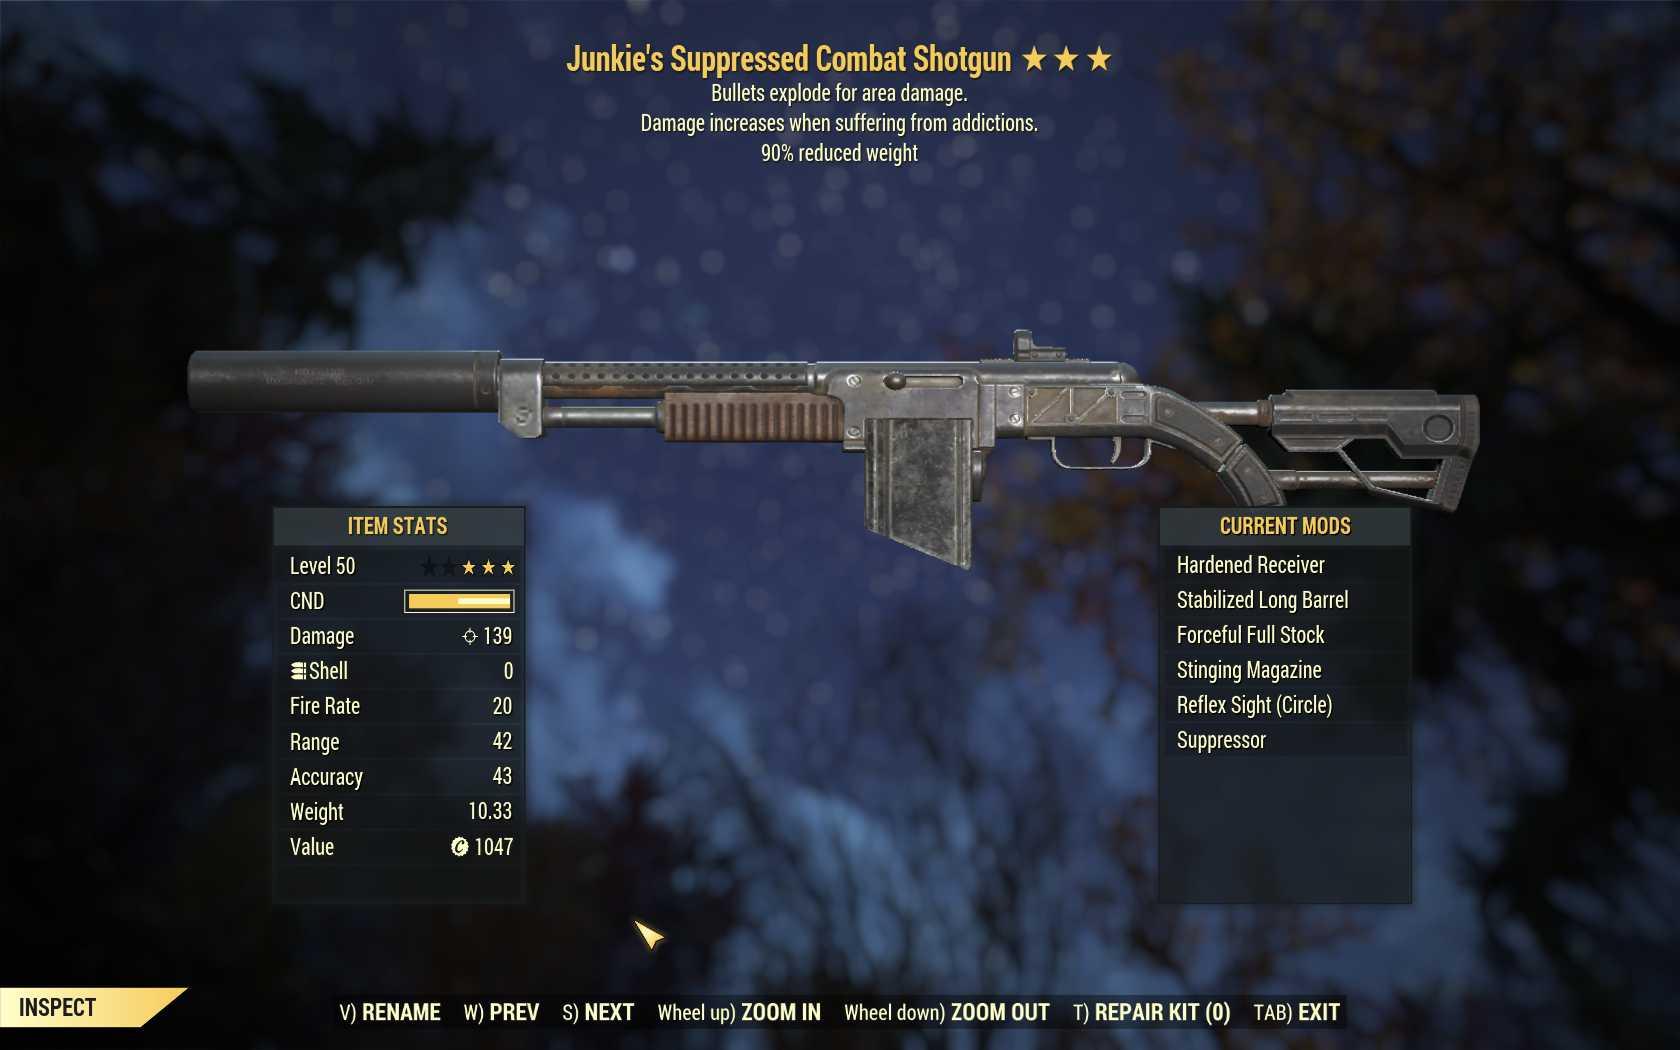 Junkie's Explosive Combat Shotgun (90% reduced weight)